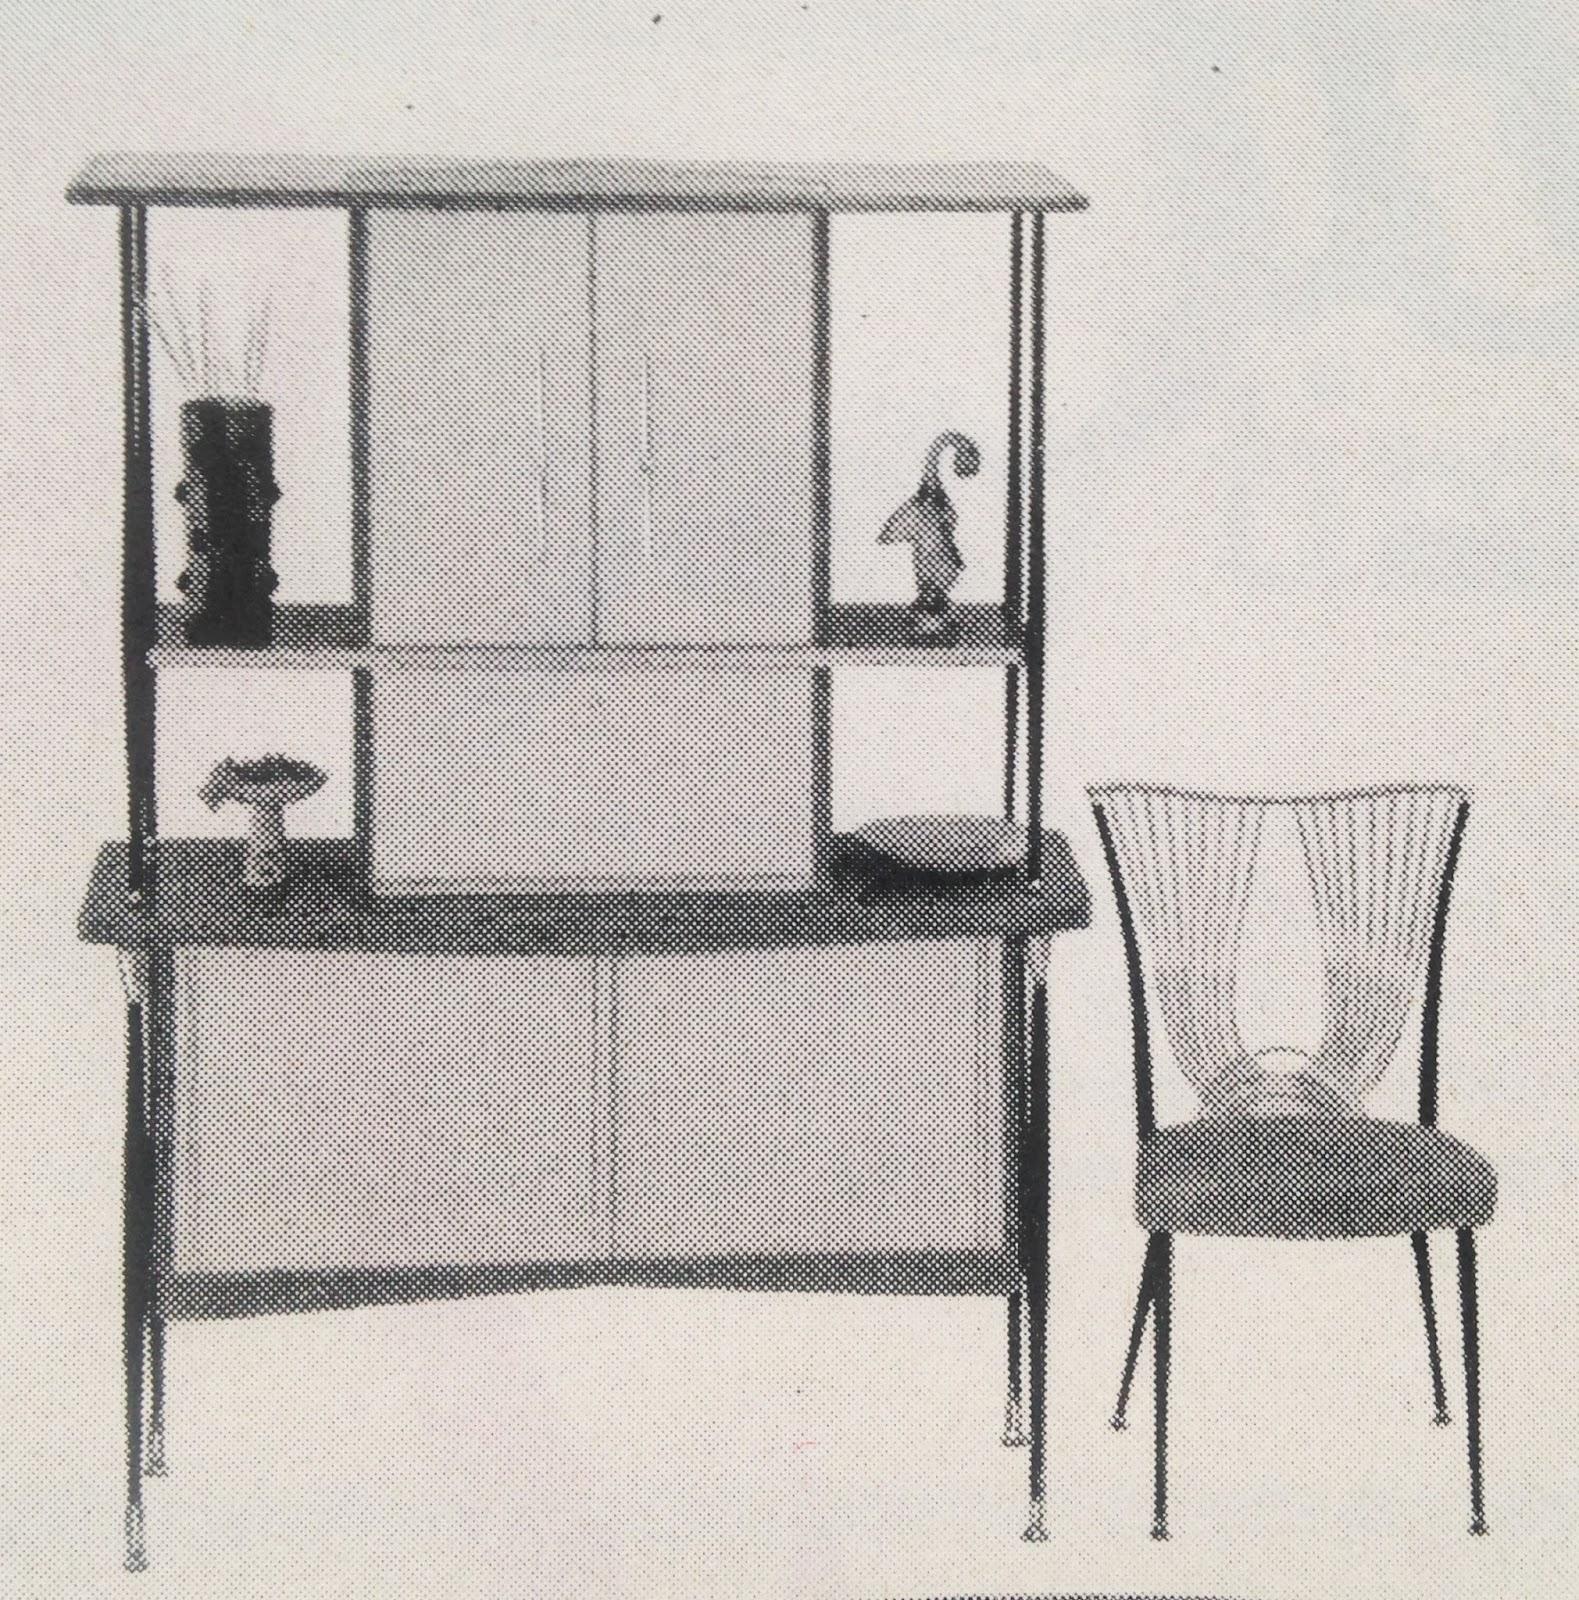 Mid Century Modern Furniture Design: Studio, Garden & Bungalow: Mid-Century Modern Furniture